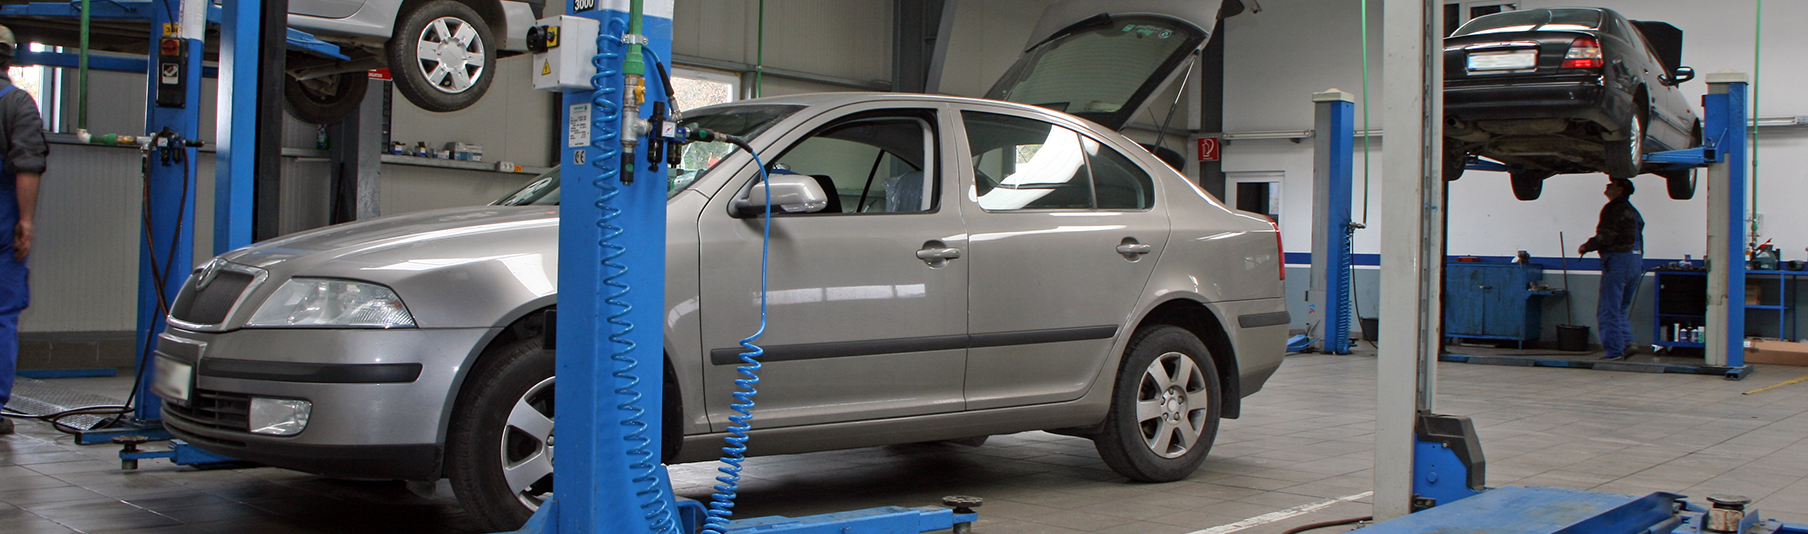 Motor Trade Insurance: A grey car inside a motor workshop